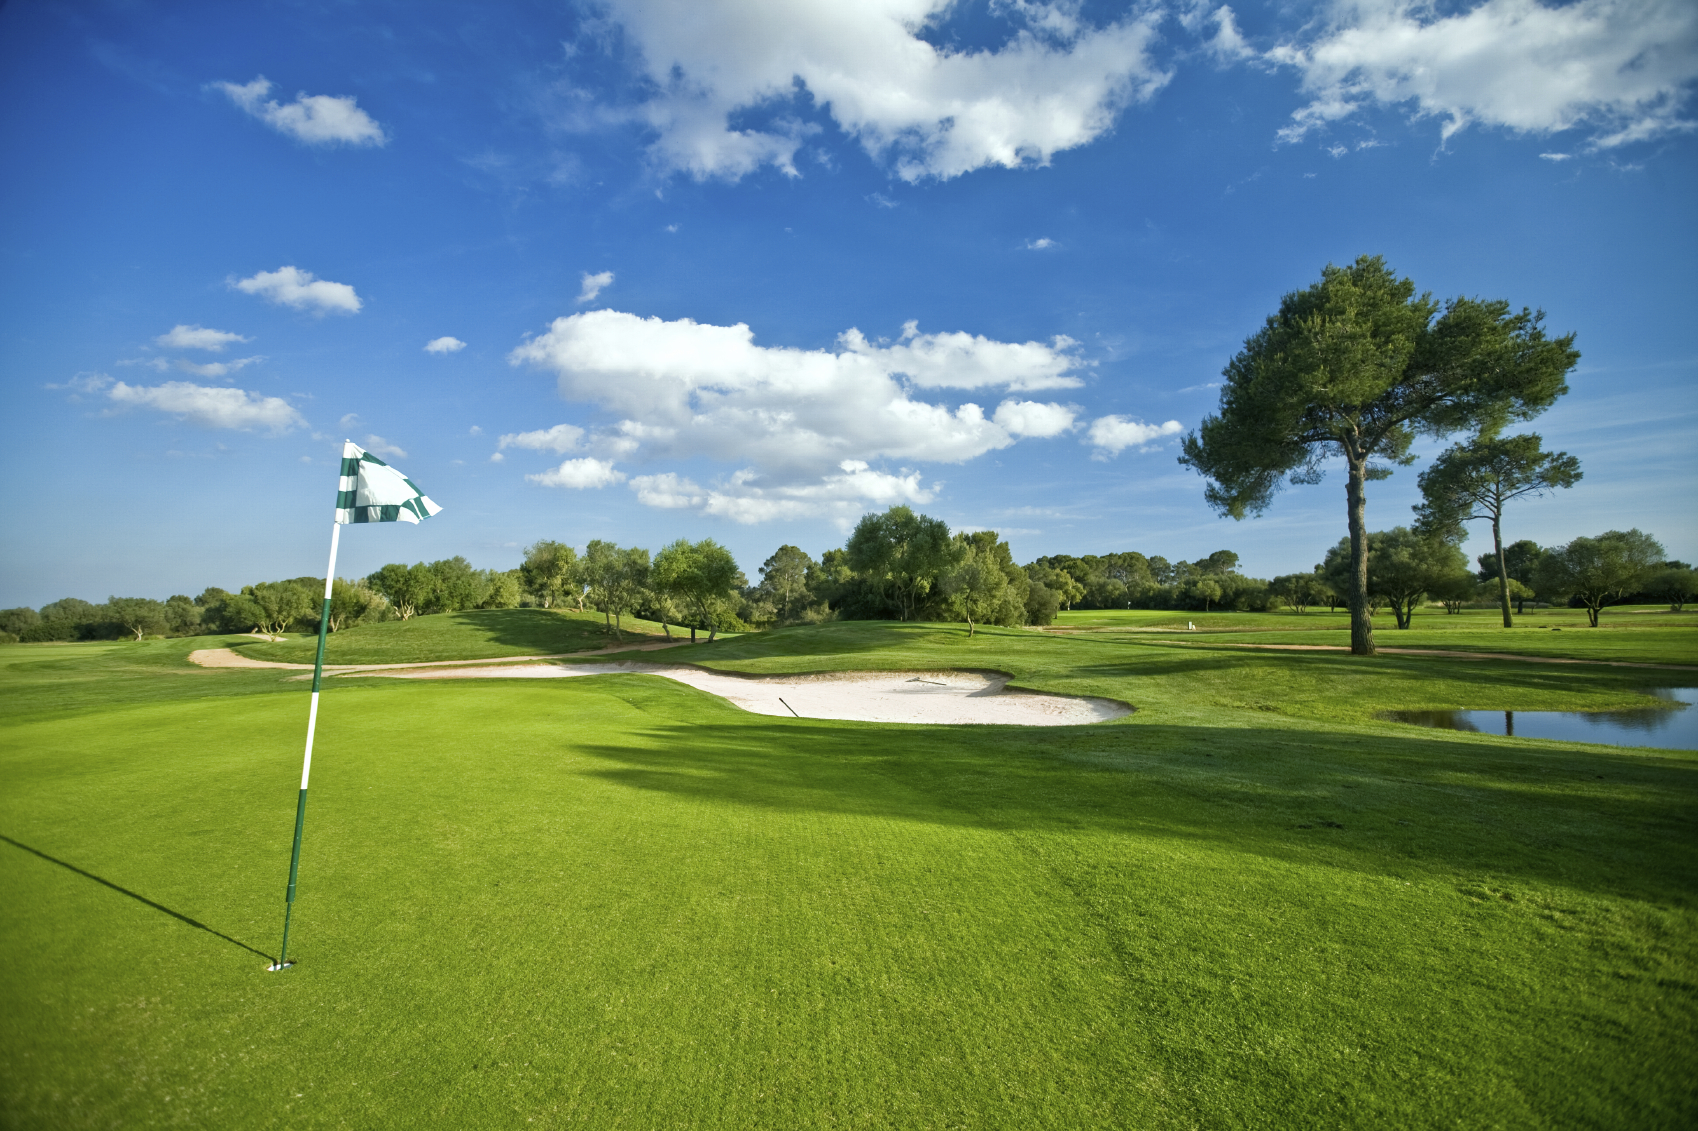 Golf iStock_000006190856Medium